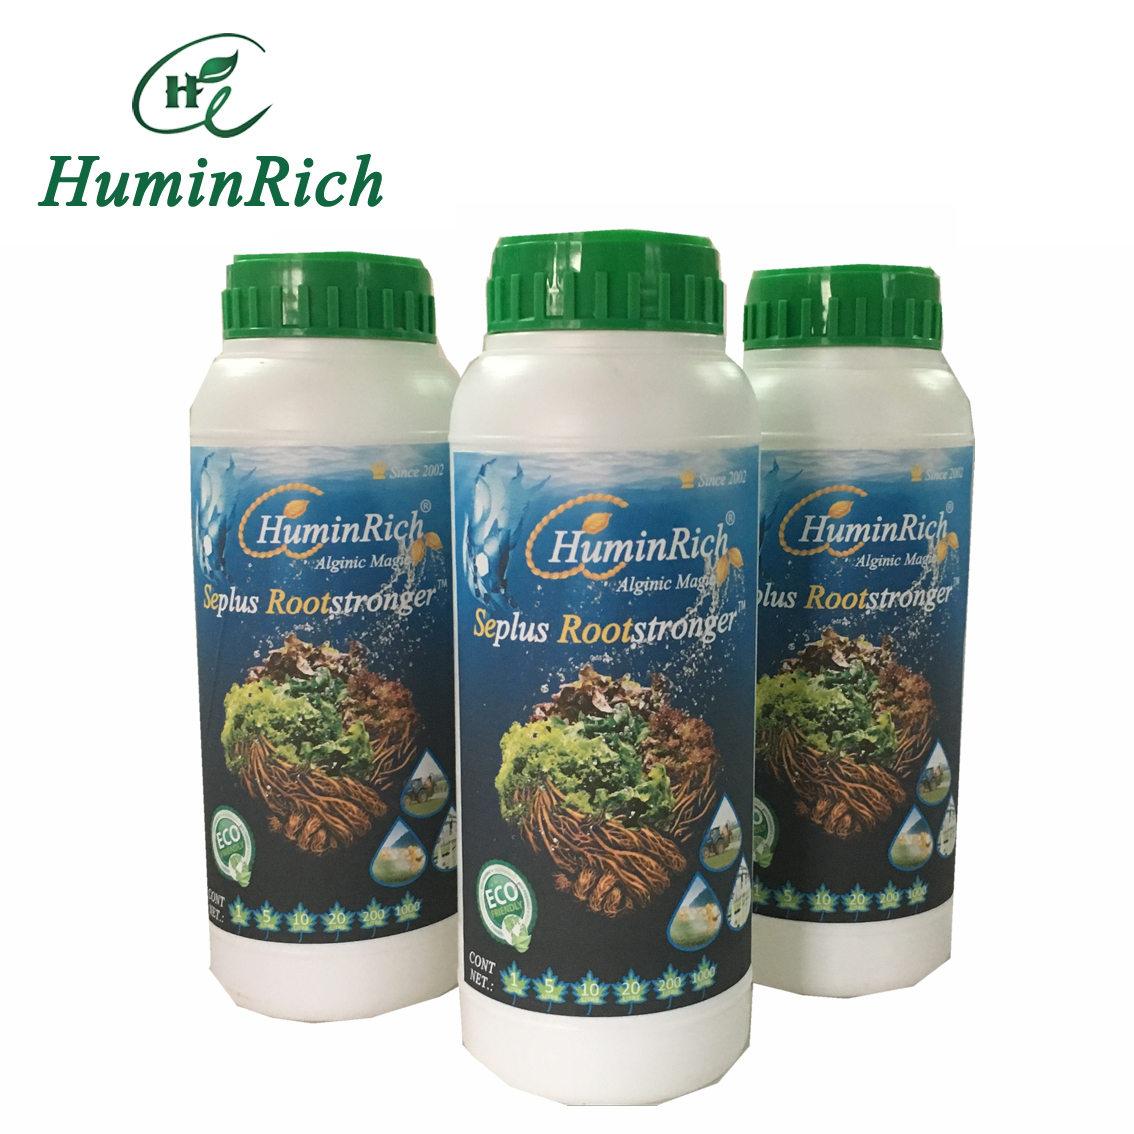 """HuminRich Seplus"" Extrato de Algas Fertilizante da Alga Ascophyllum Nodosum Fertilizante Líquido"